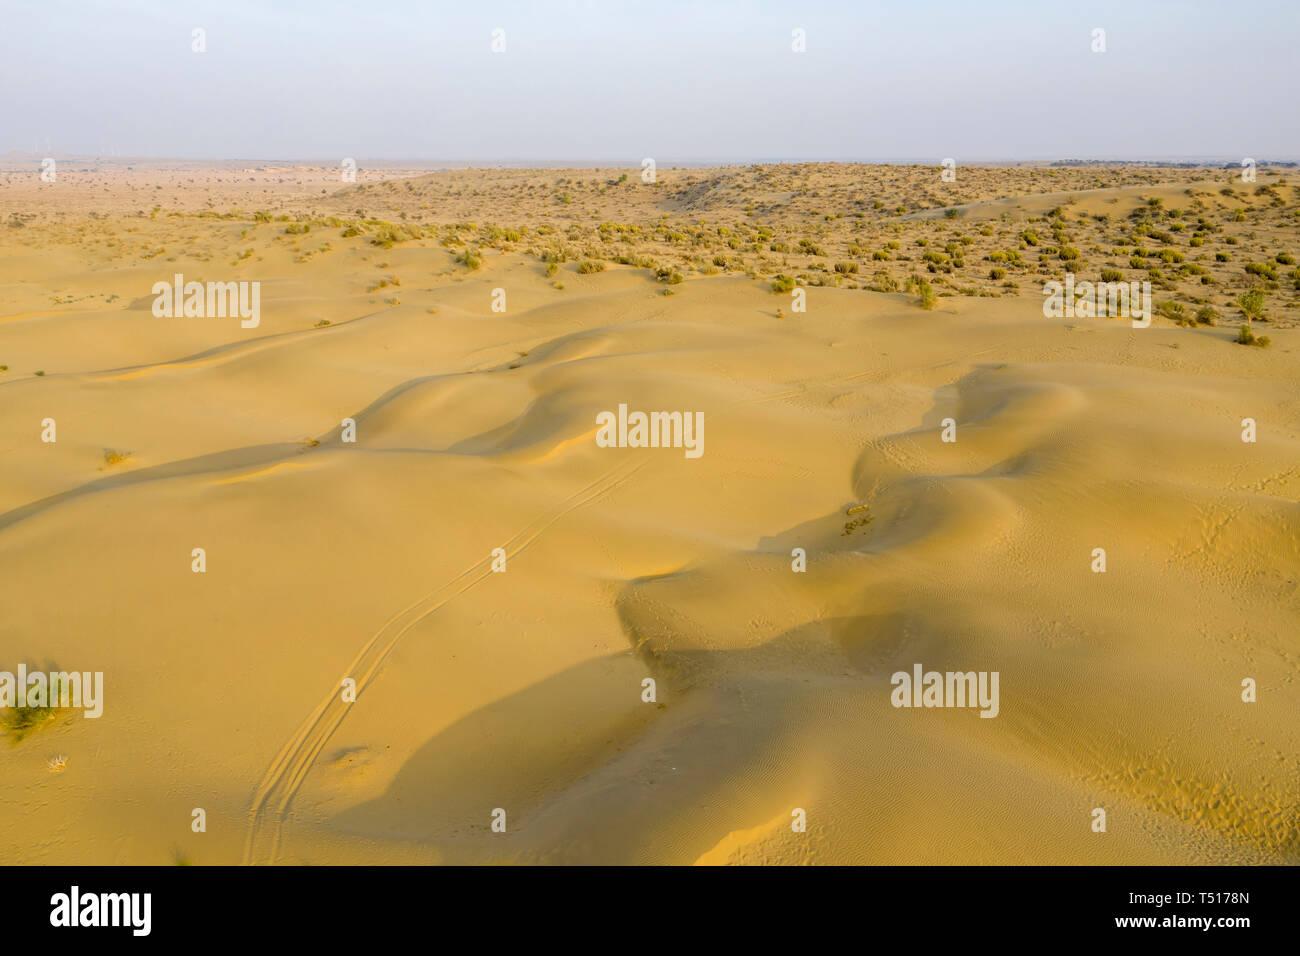 India, Rajasthan, Jaisalmer, Khuri Desert - Stock Image